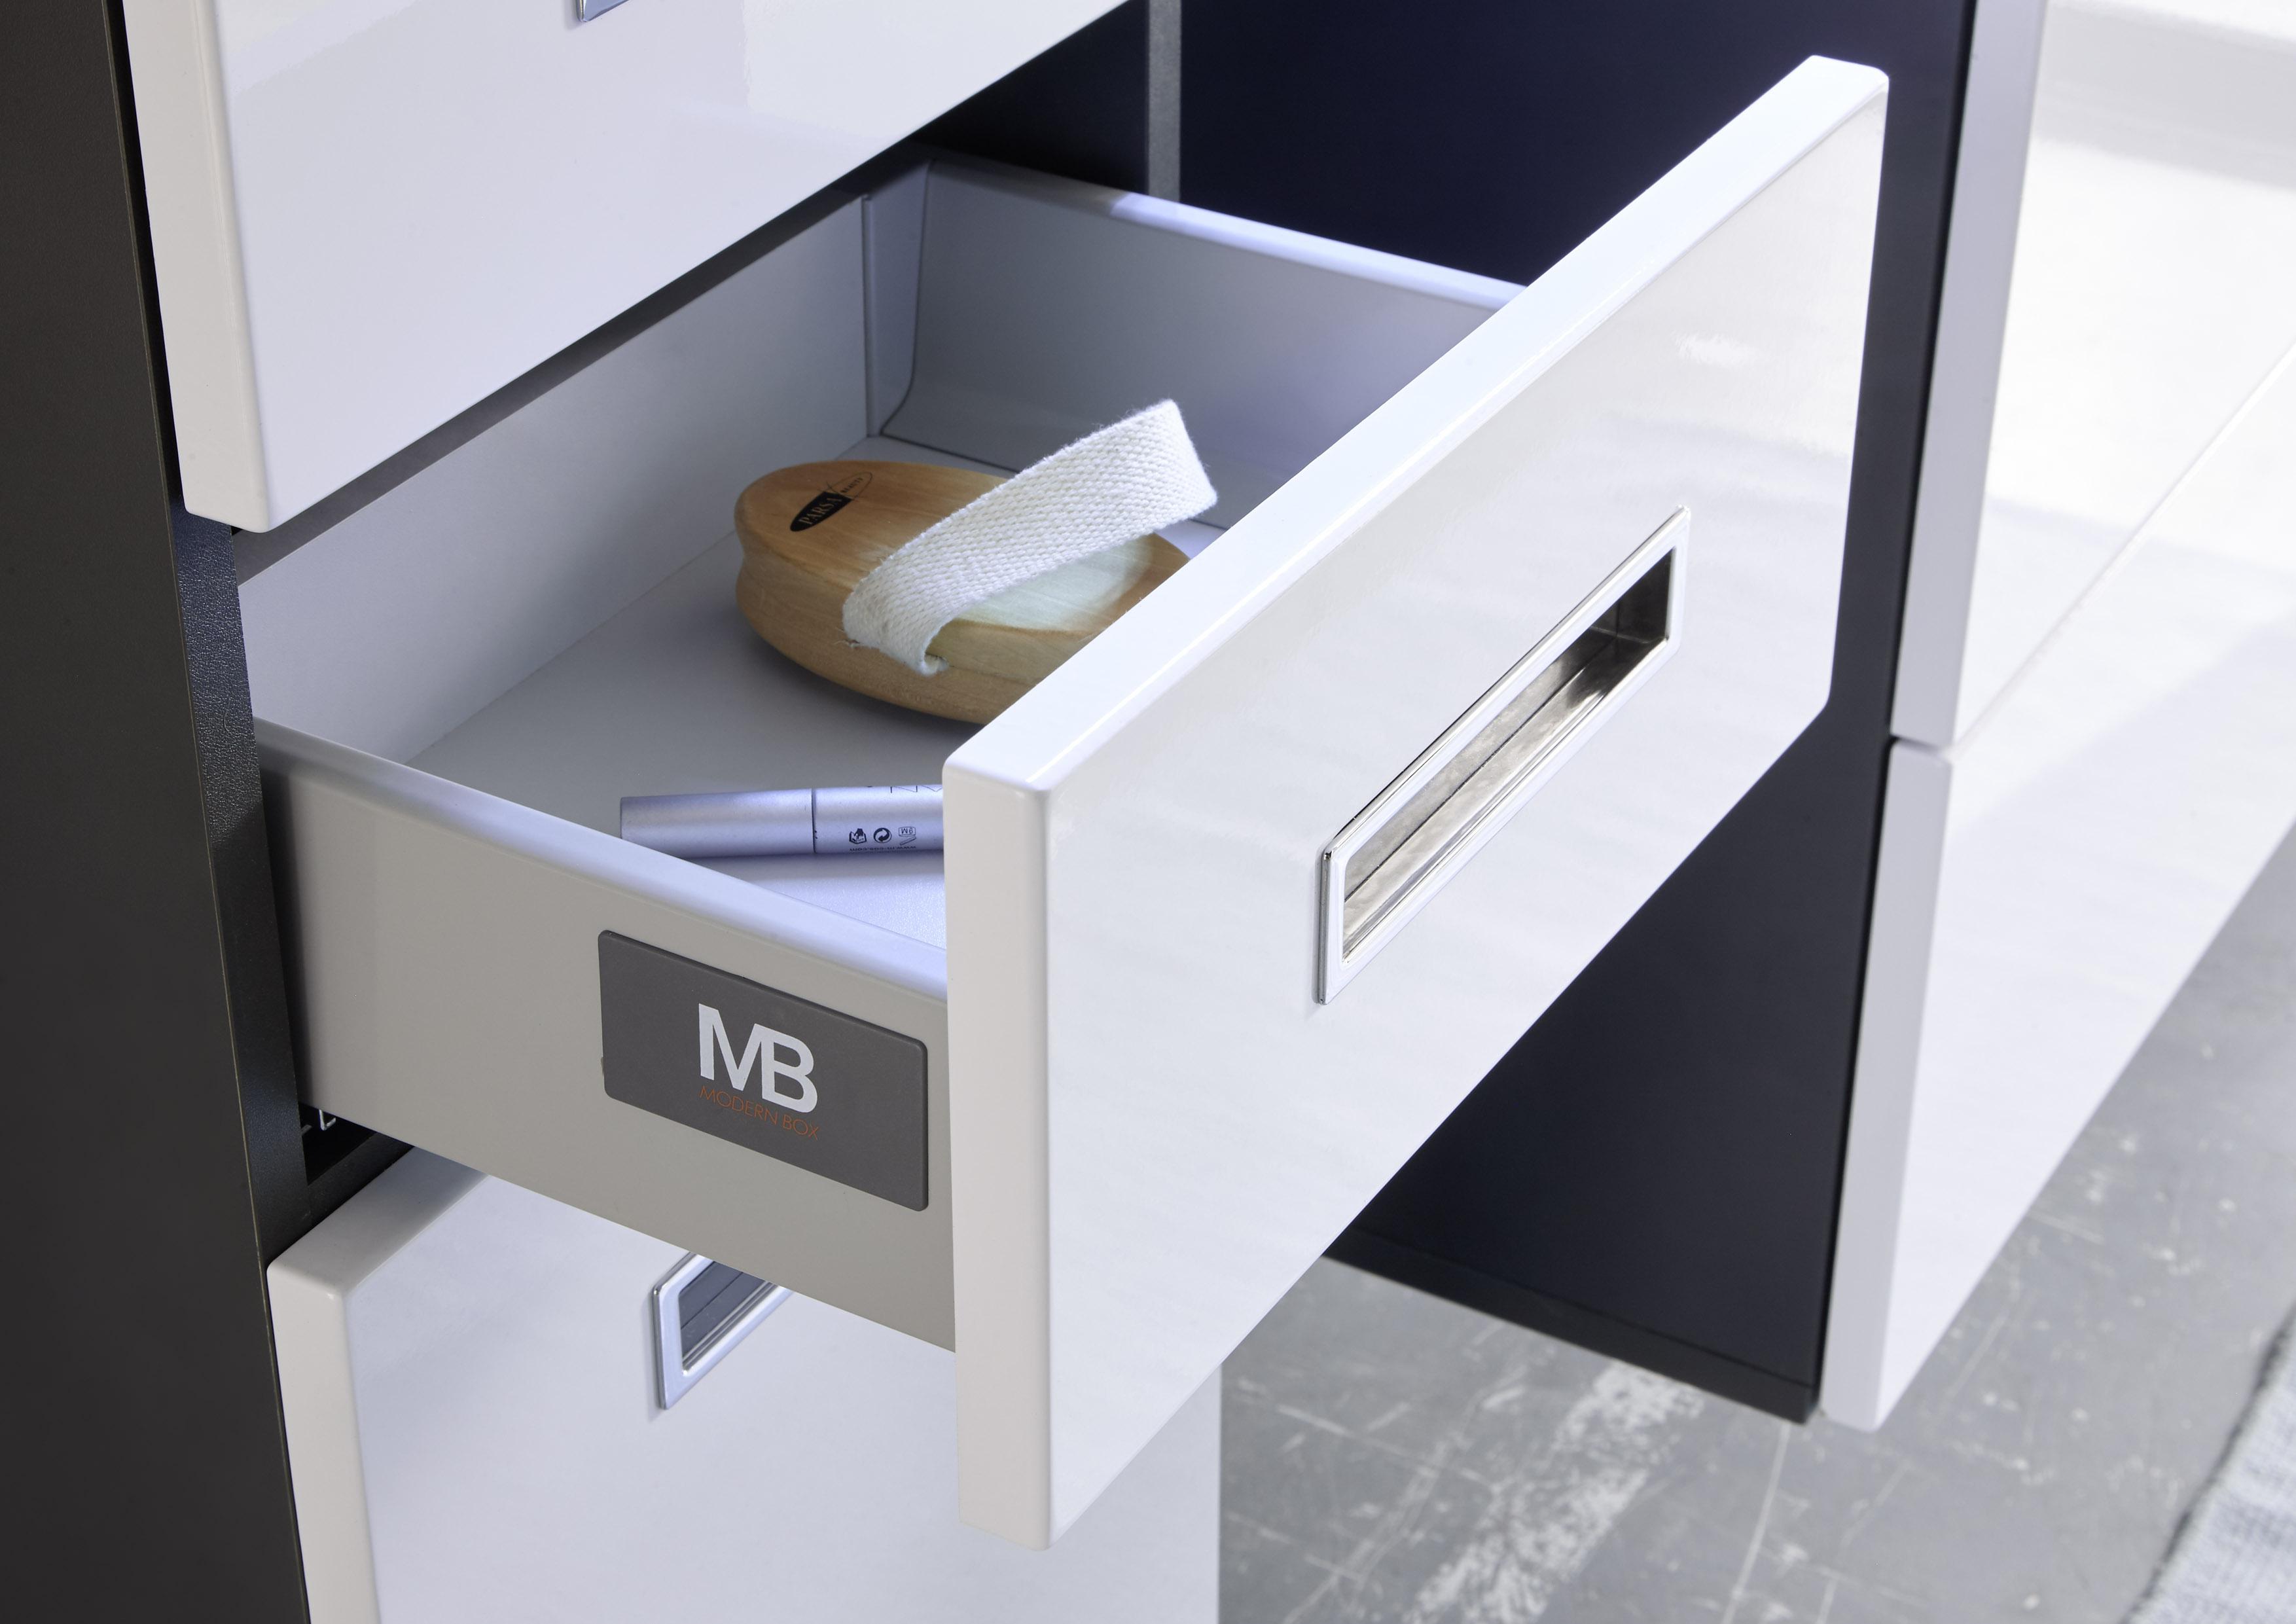 badezimmer set manhattan 5 tlg badezimmer badm bel badezimmerm bel wei grau ebay. Black Bedroom Furniture Sets. Home Design Ideas